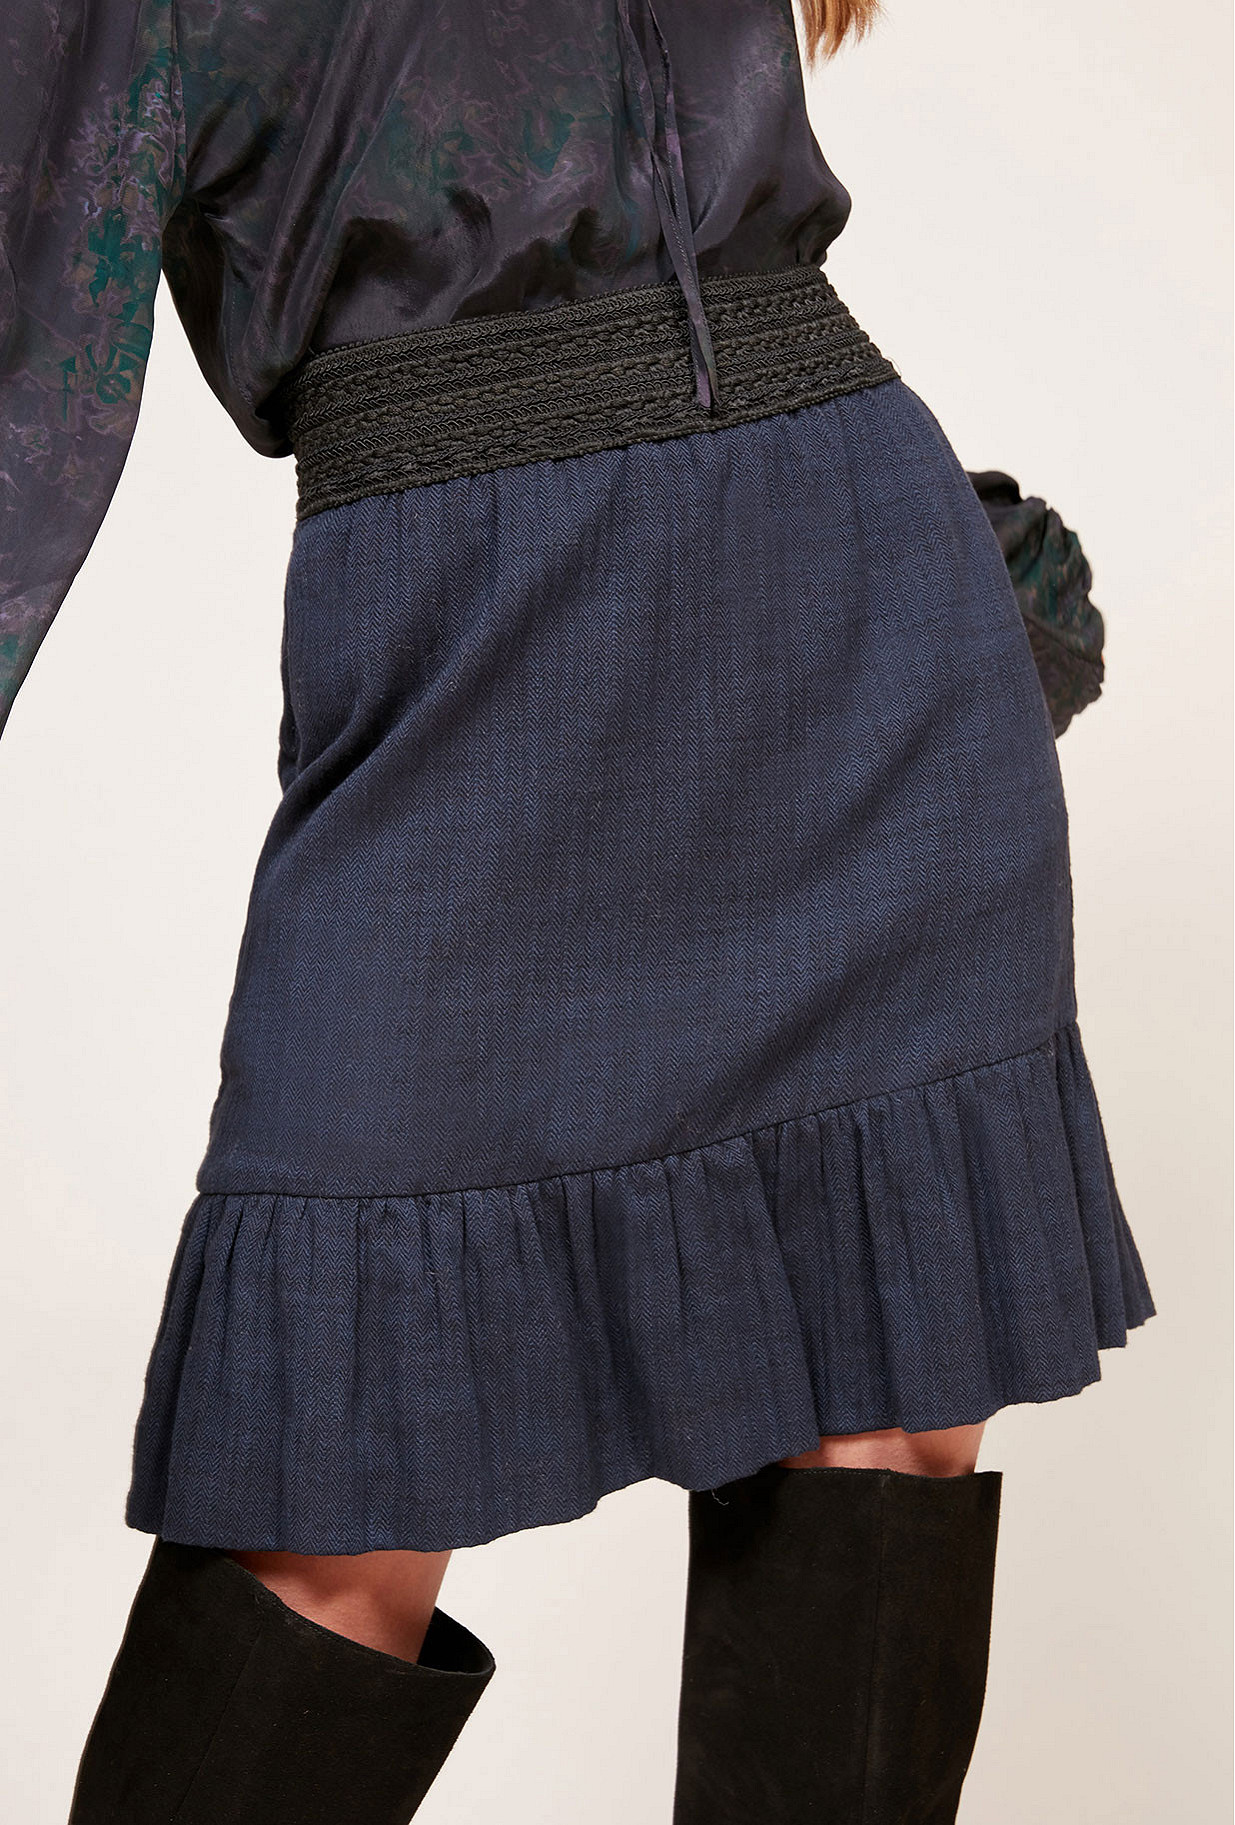 Blue  Skirt  Babko Mes demoiselles fashion clothes designer Paris